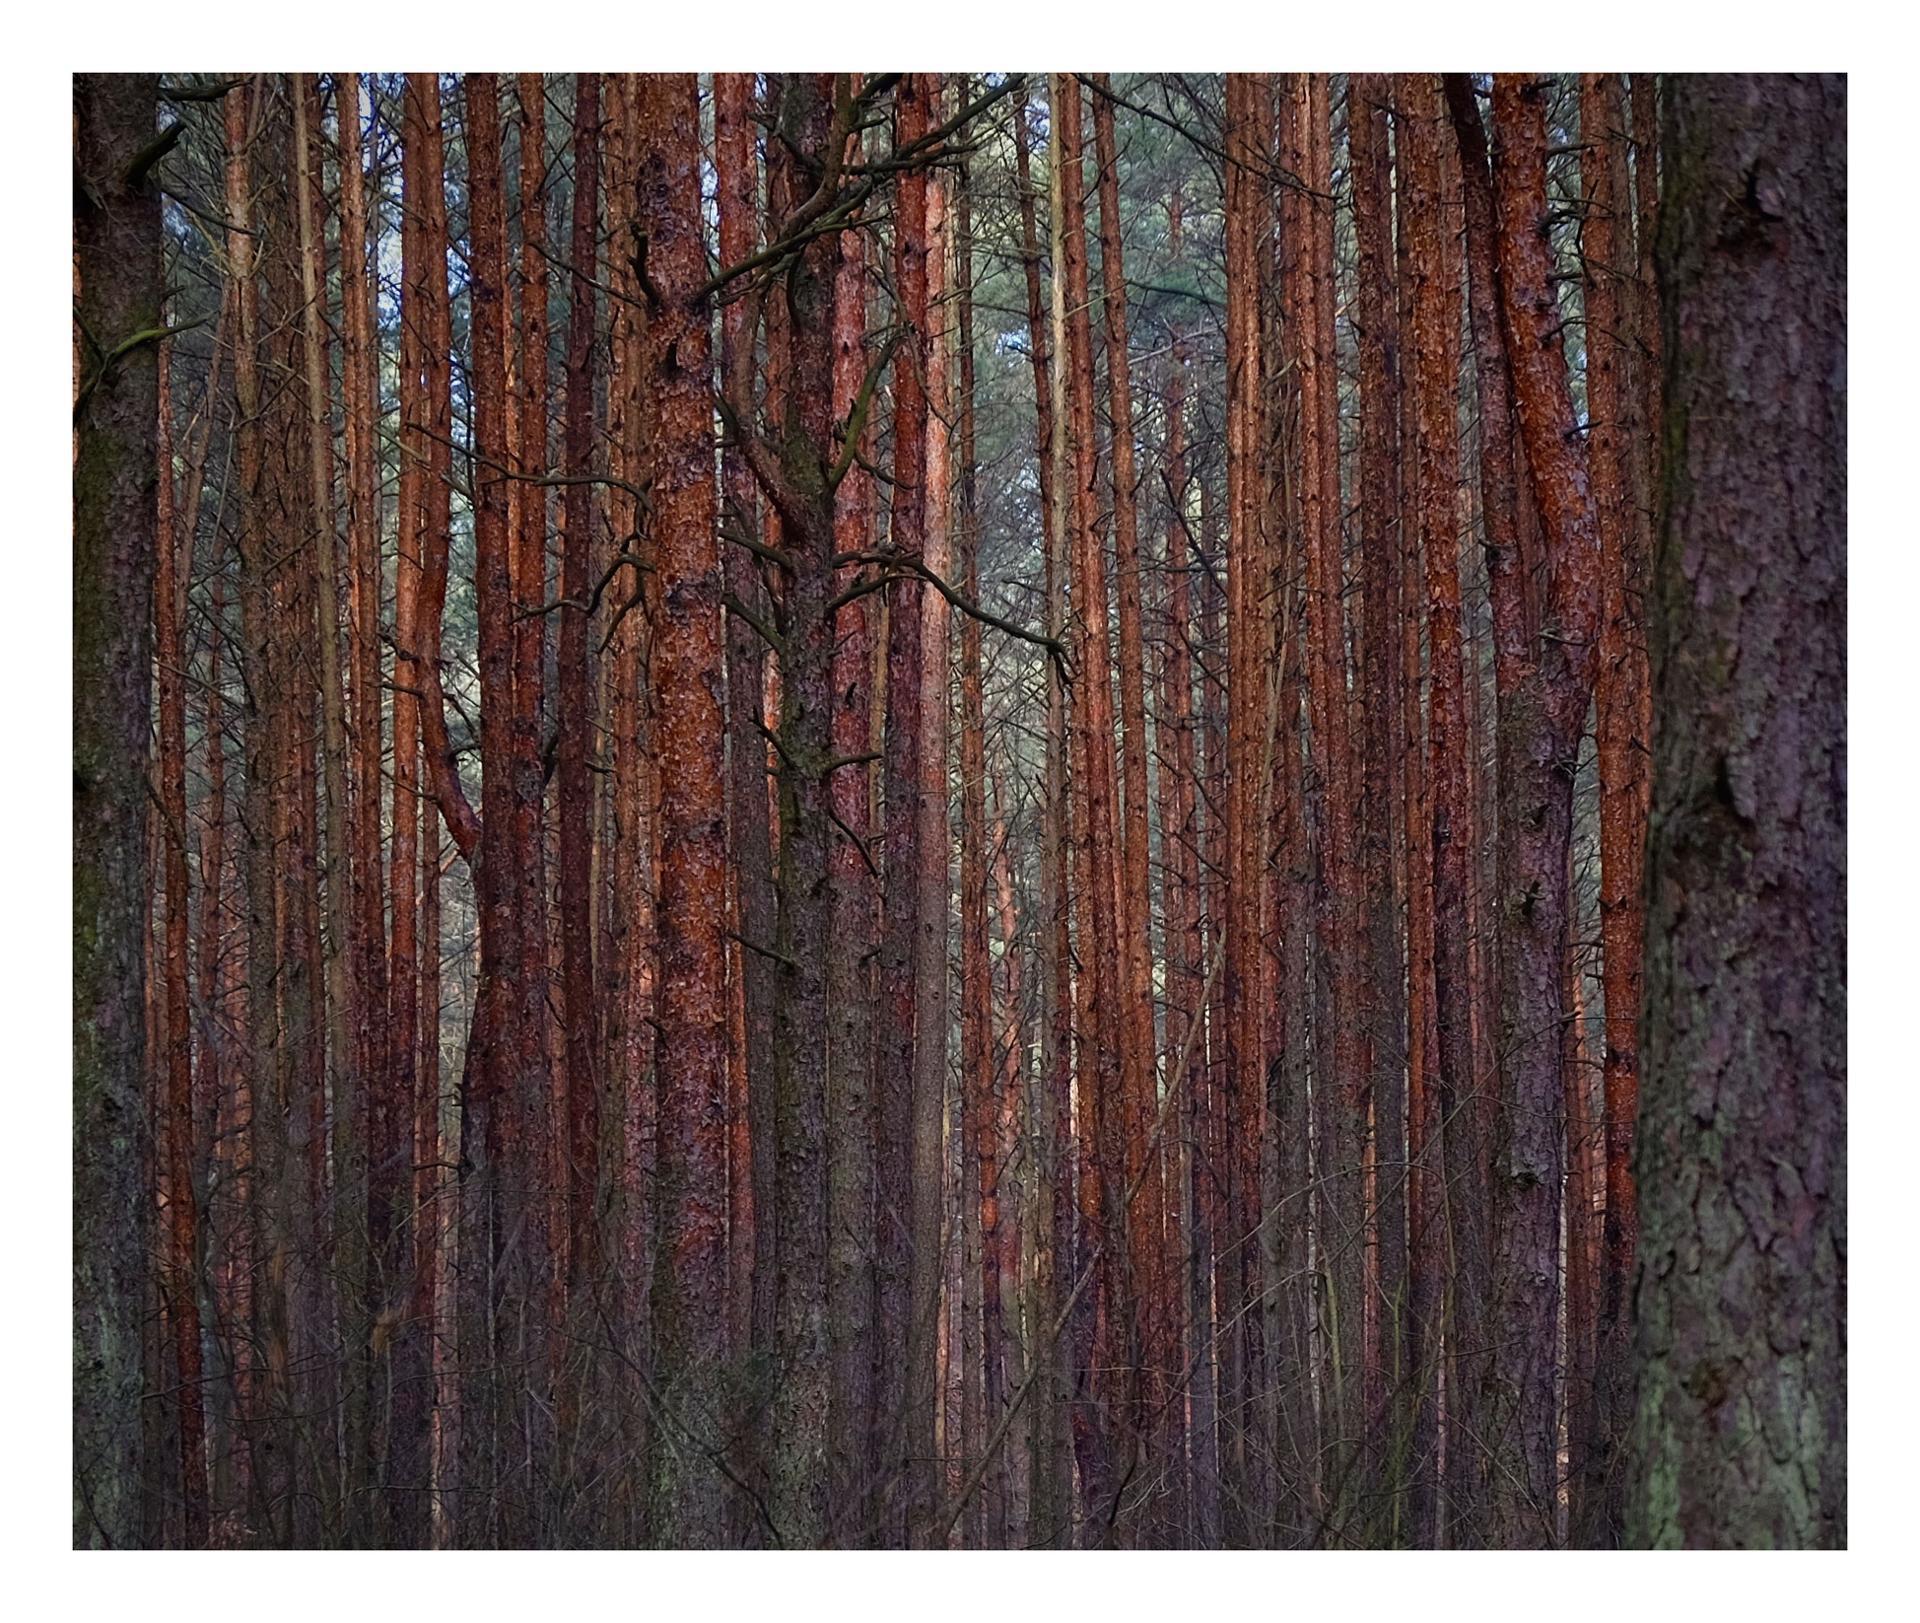 Forêt à l'infini